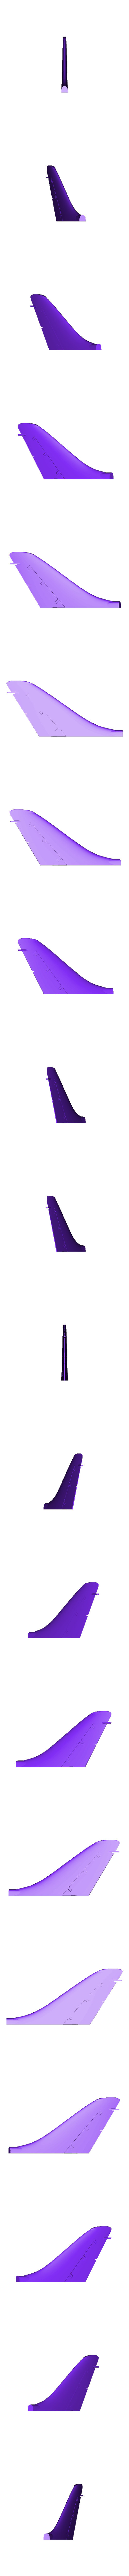 05- vertical Fin.stl Download STL file DOUGLAS F4D SKYRAY  • 3D printer object, 3DprintedArmy